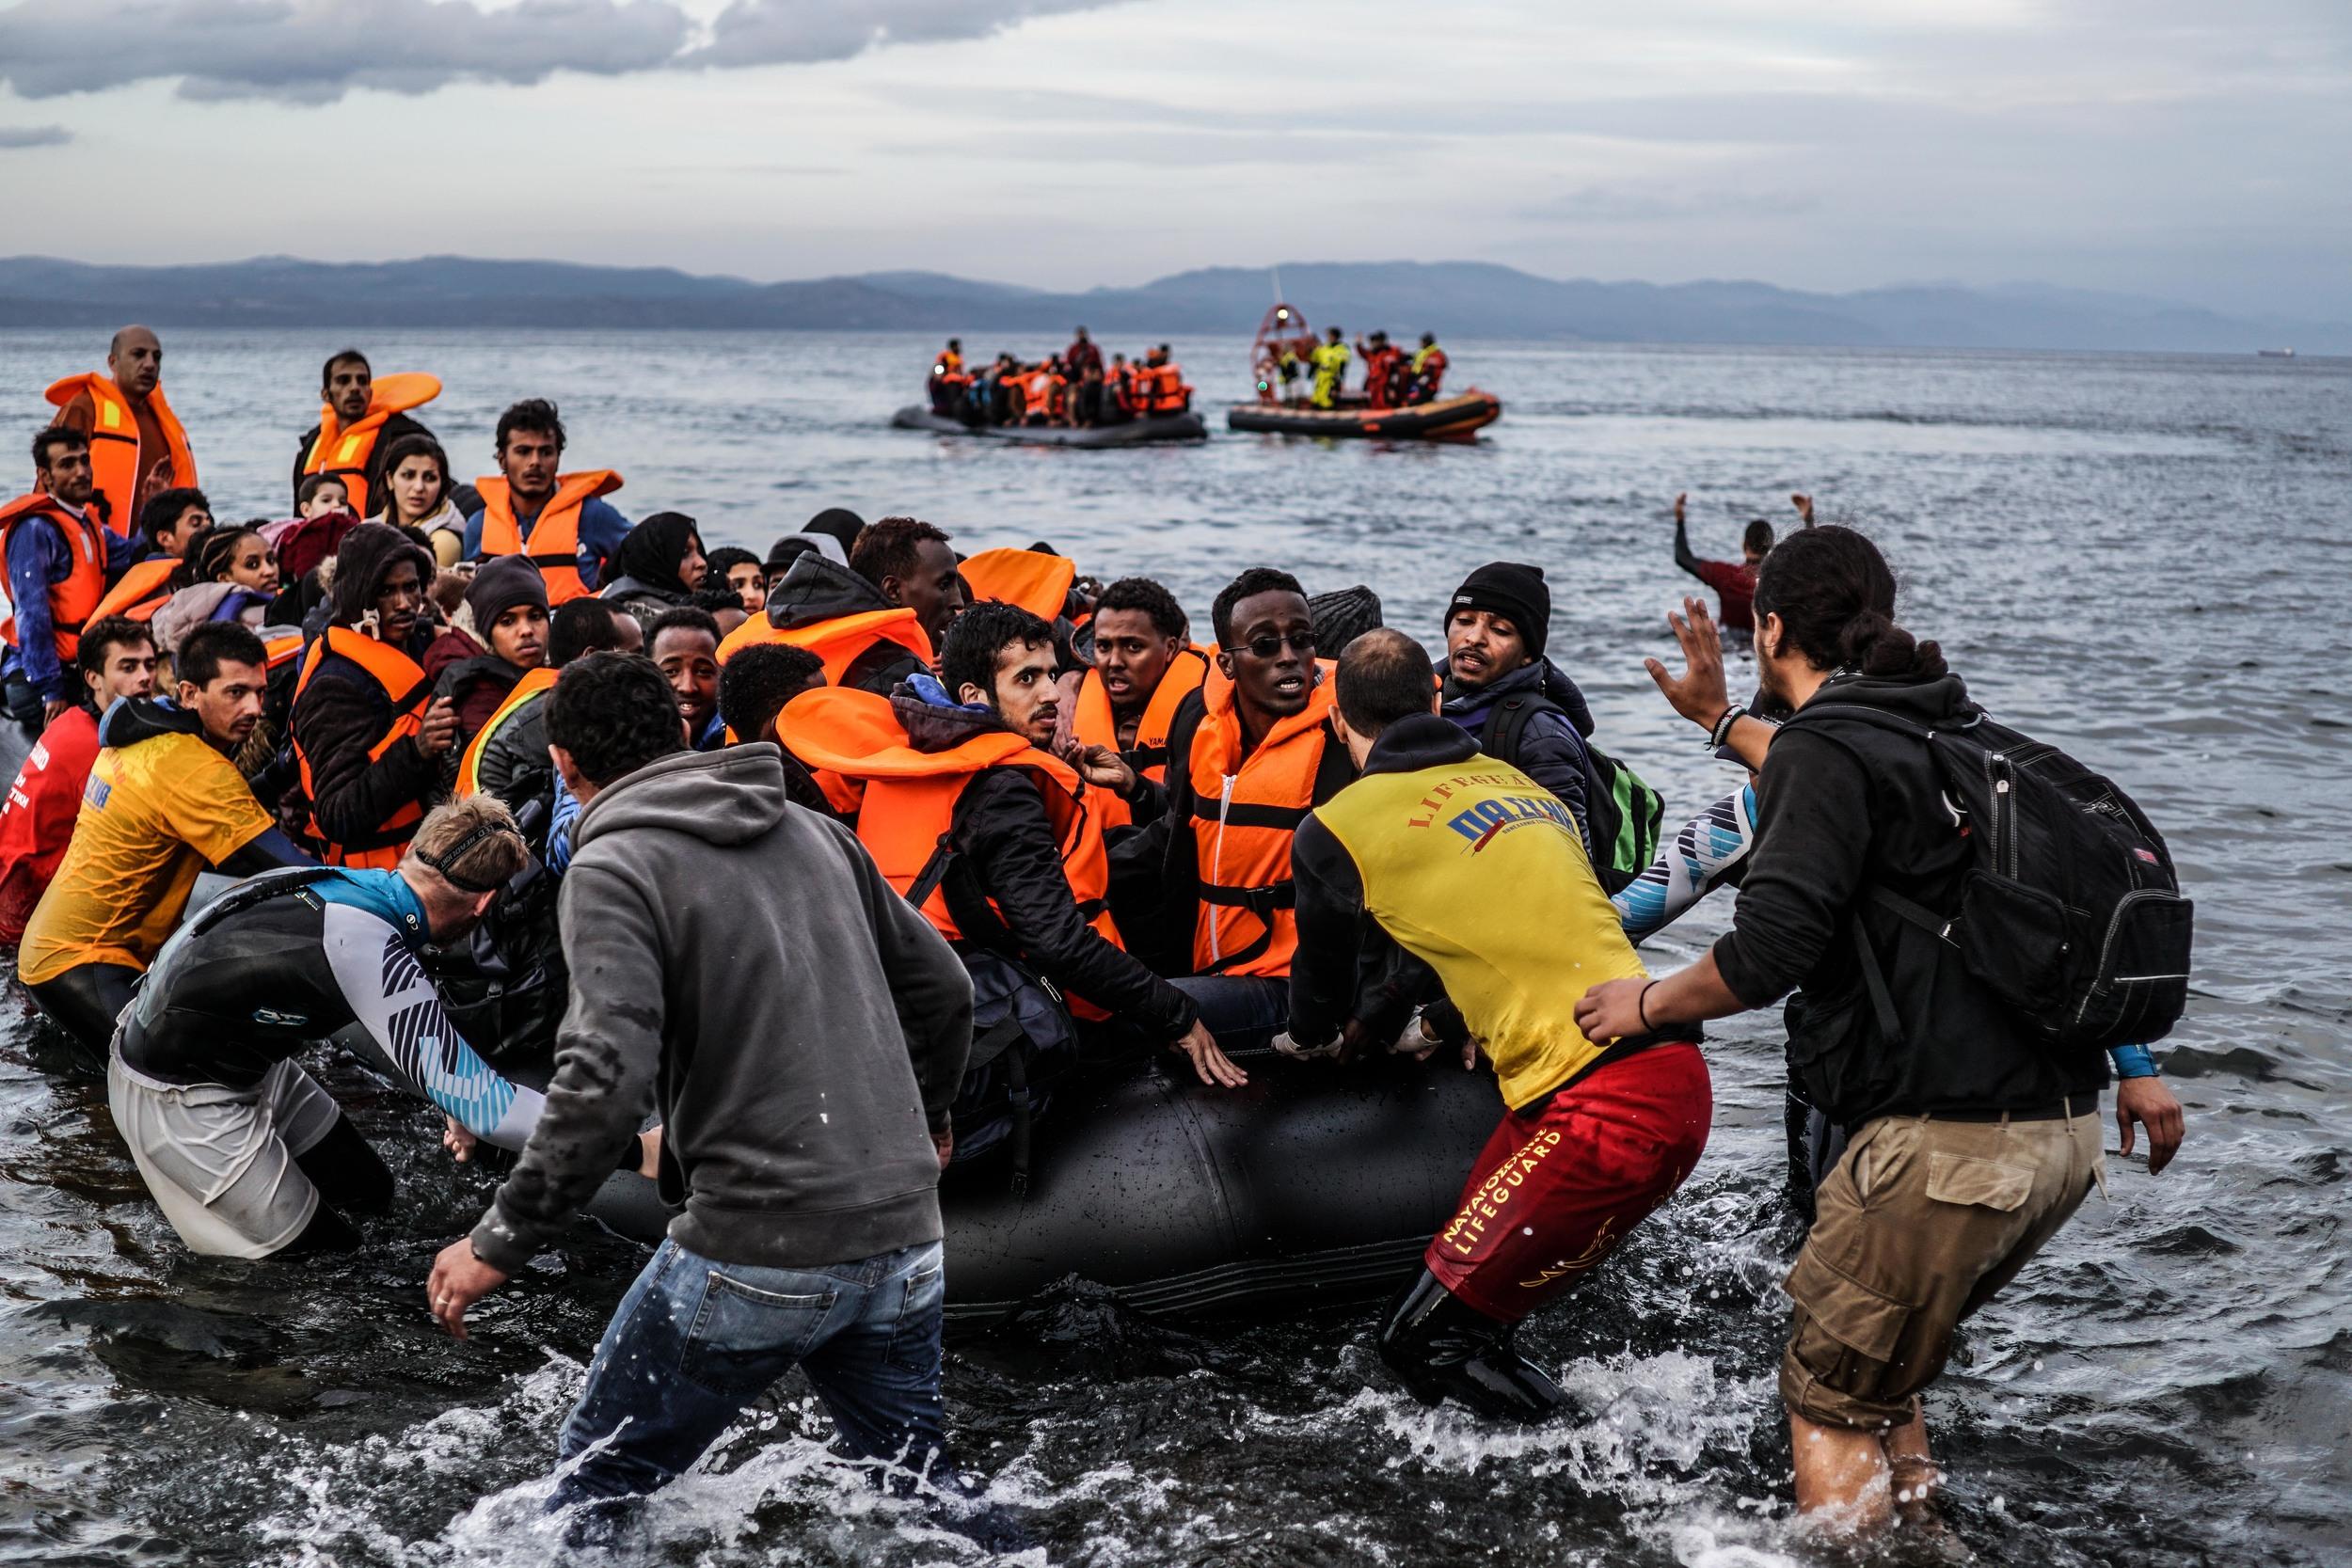 Syrian Refugee Crisis Lesbos Greece November 2015 23.jpg